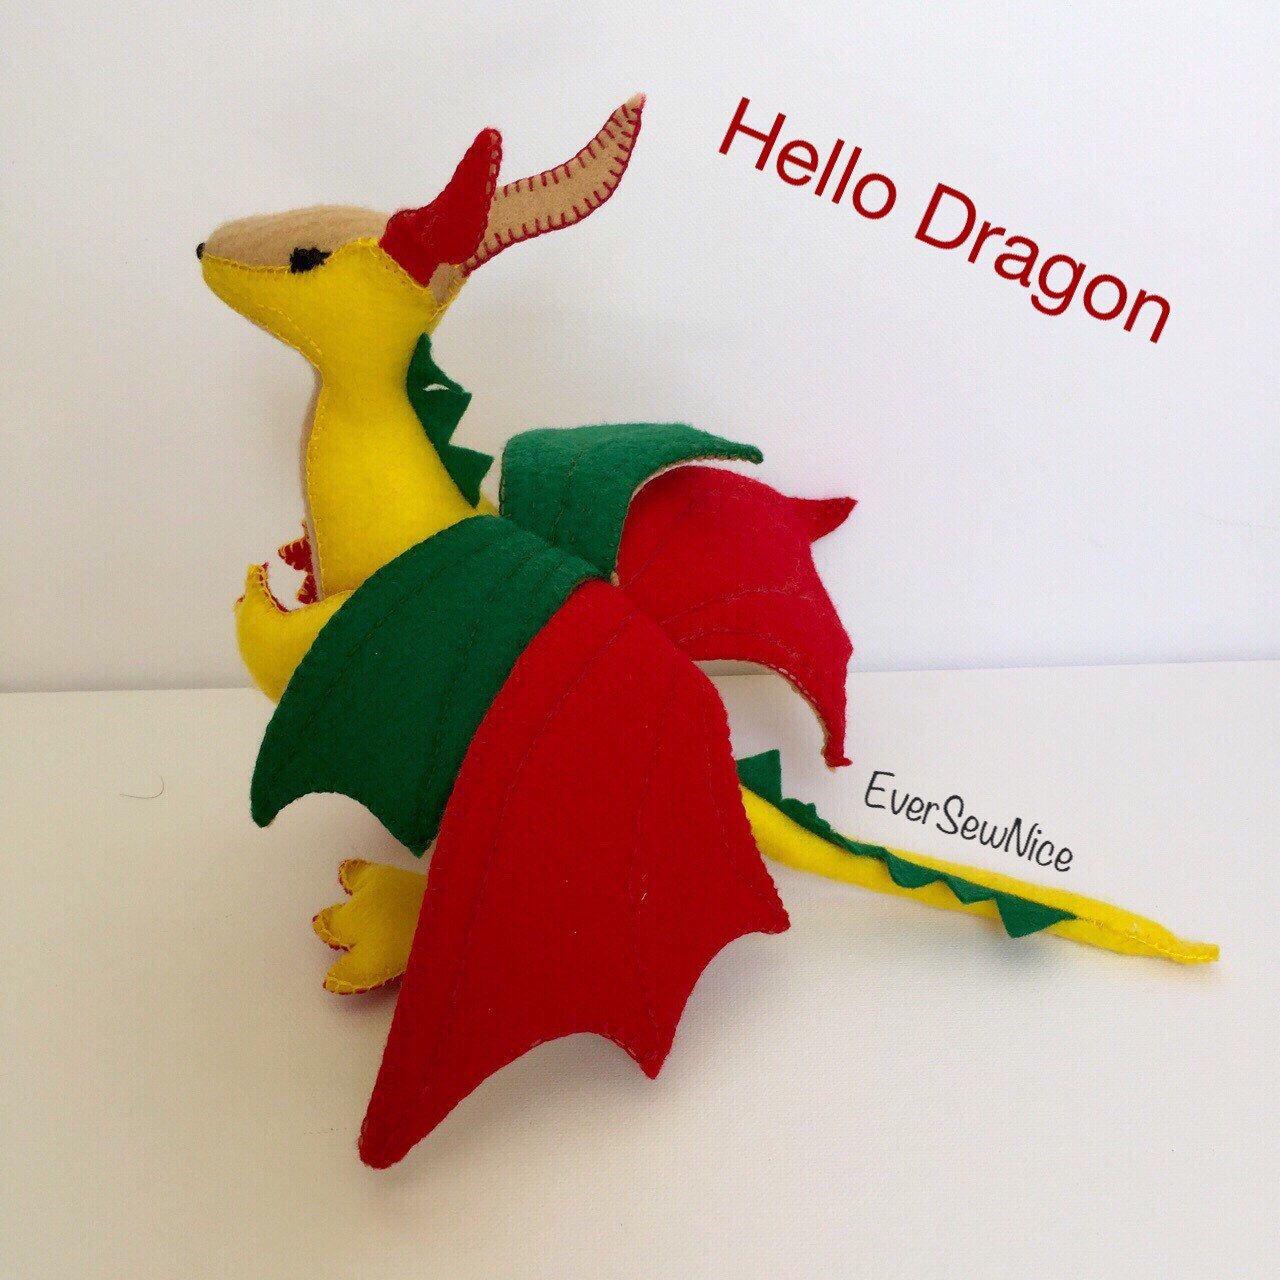 Handmade Felt Dragon - Felt Plushie - Felt Toy - Felt Dragon - Dragon Toy - Gift - Ornament - Toy Gift - Freestanding Dragon by EverSewNice on Etsy https://www.etsy.com/listing/271015516/handmade-felt-dragon-felt-plushie-felt